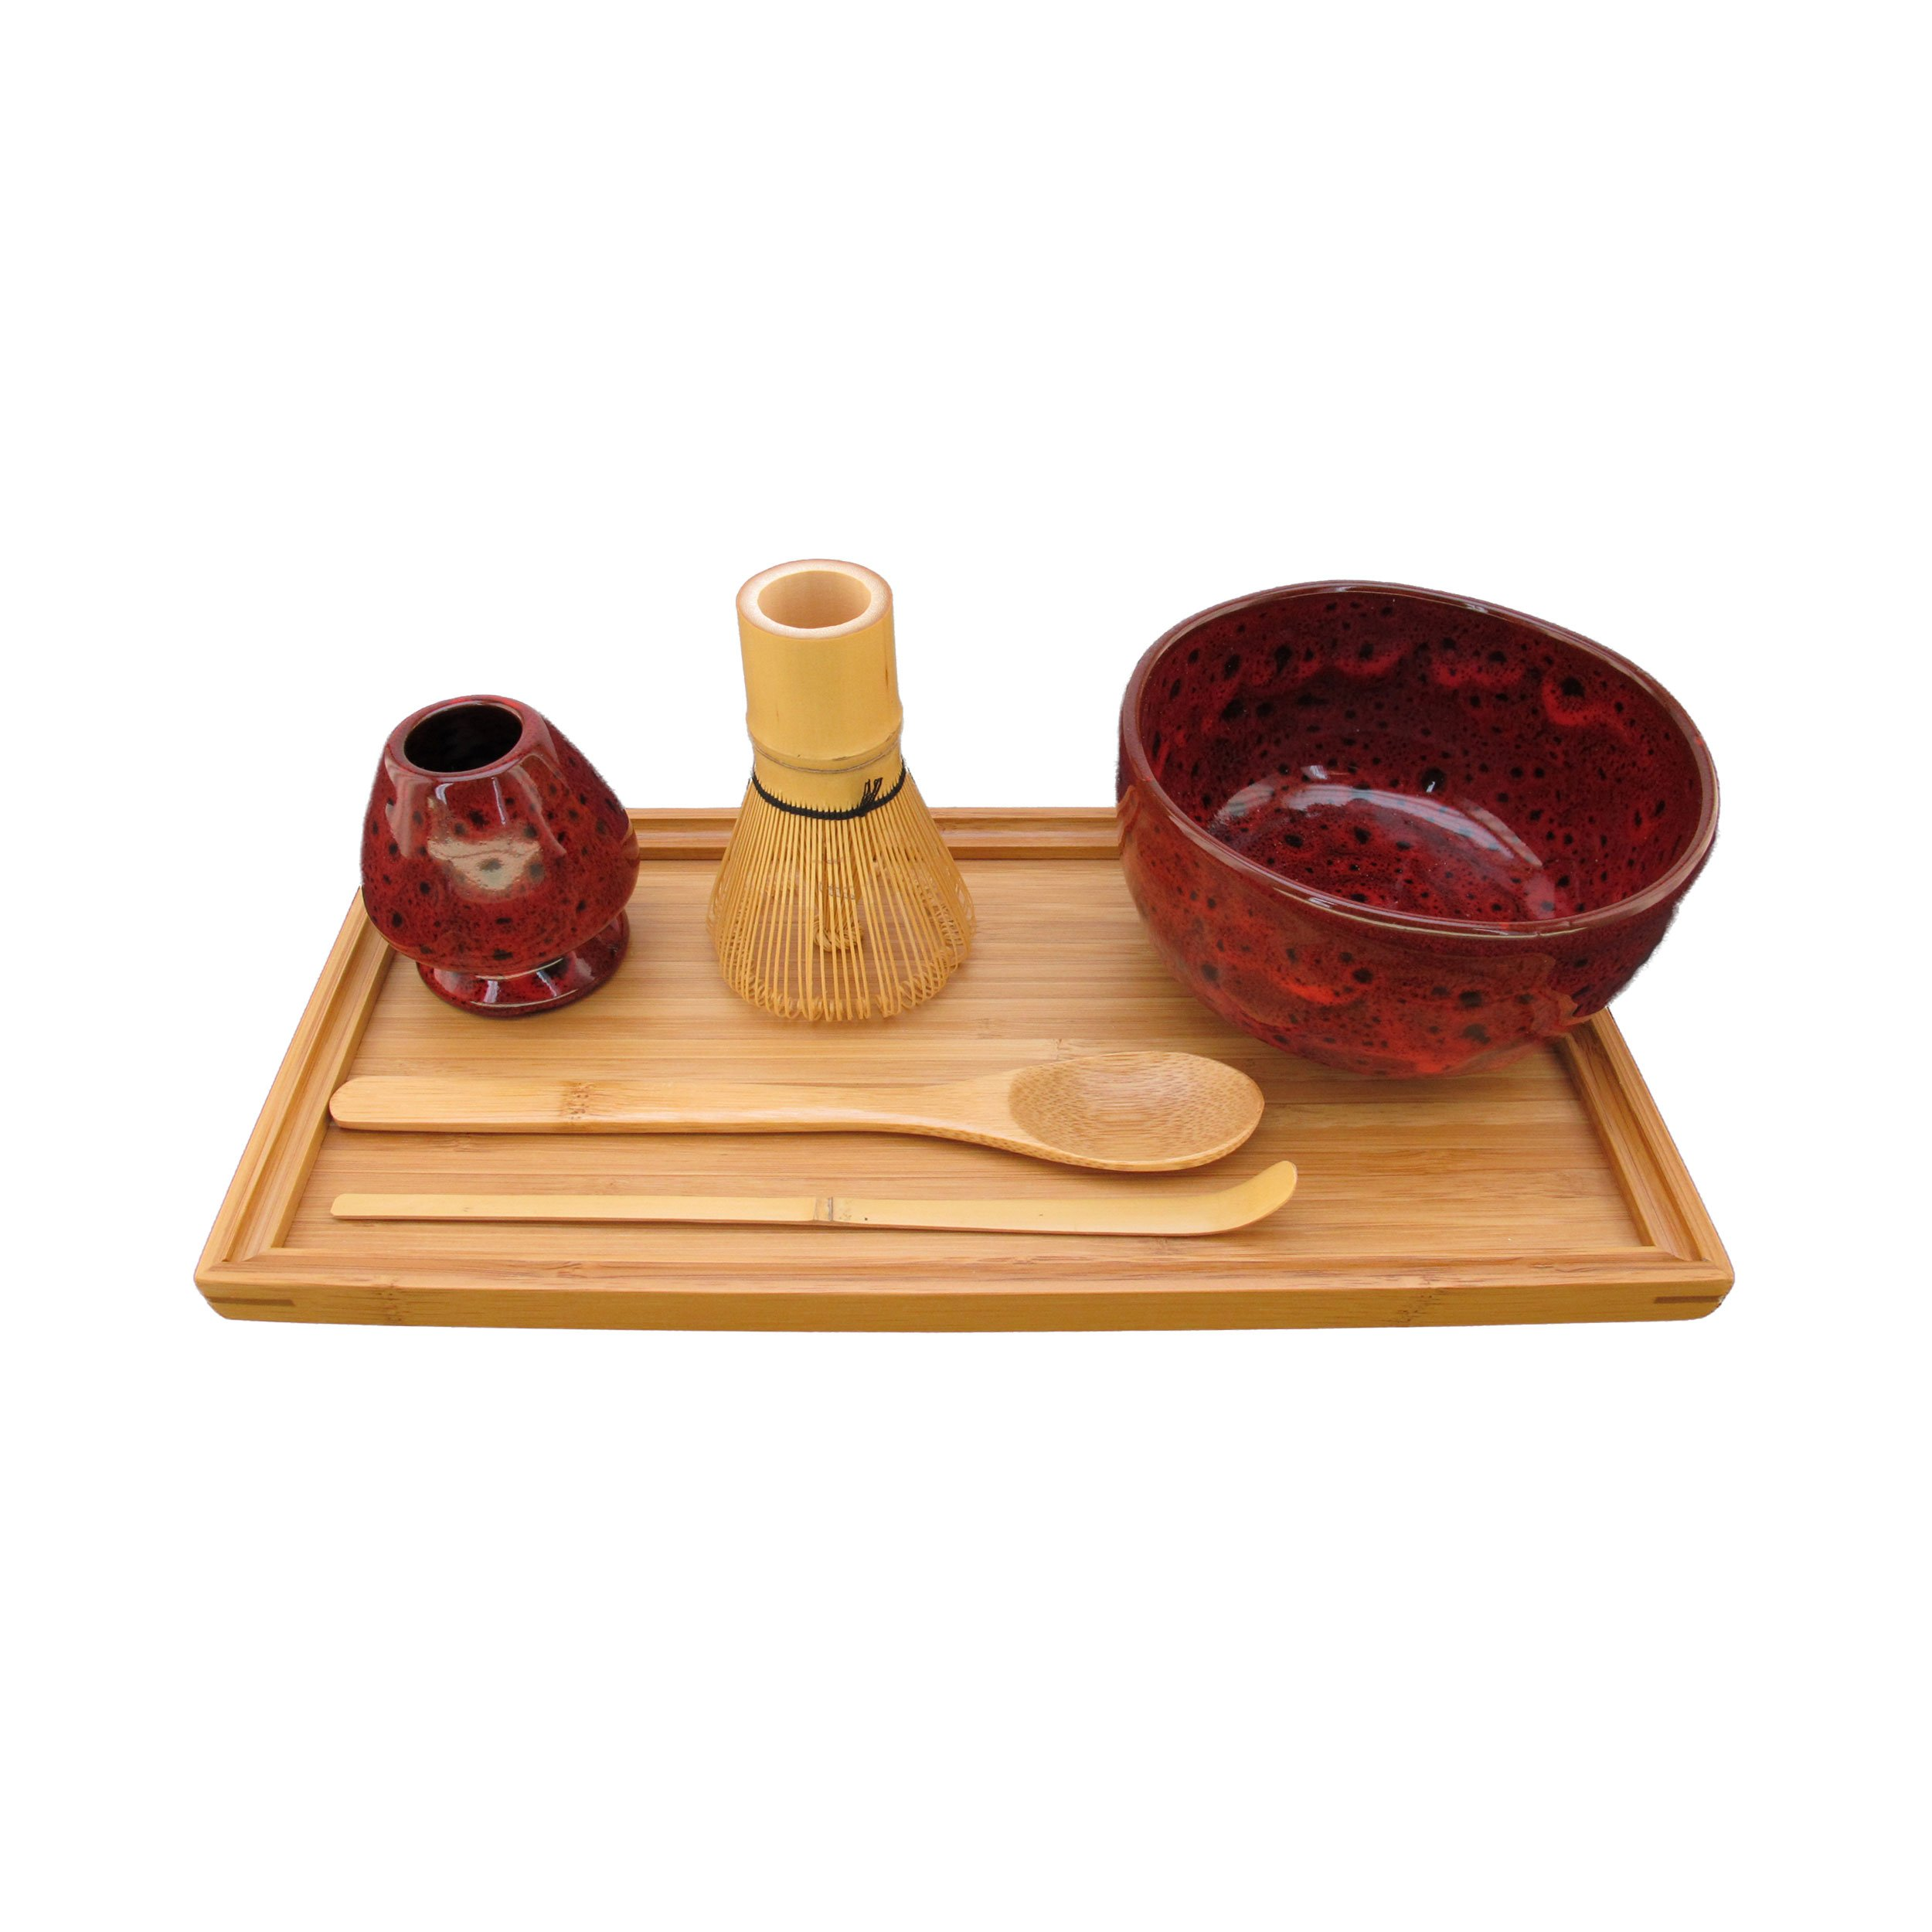 BambooMN Brand - Matcha Bowl Set (Includes Bowl, Rest,Tea Whisk, Chasaku, Tea Spoon & Tray) 1 Set Deep Red w/Black